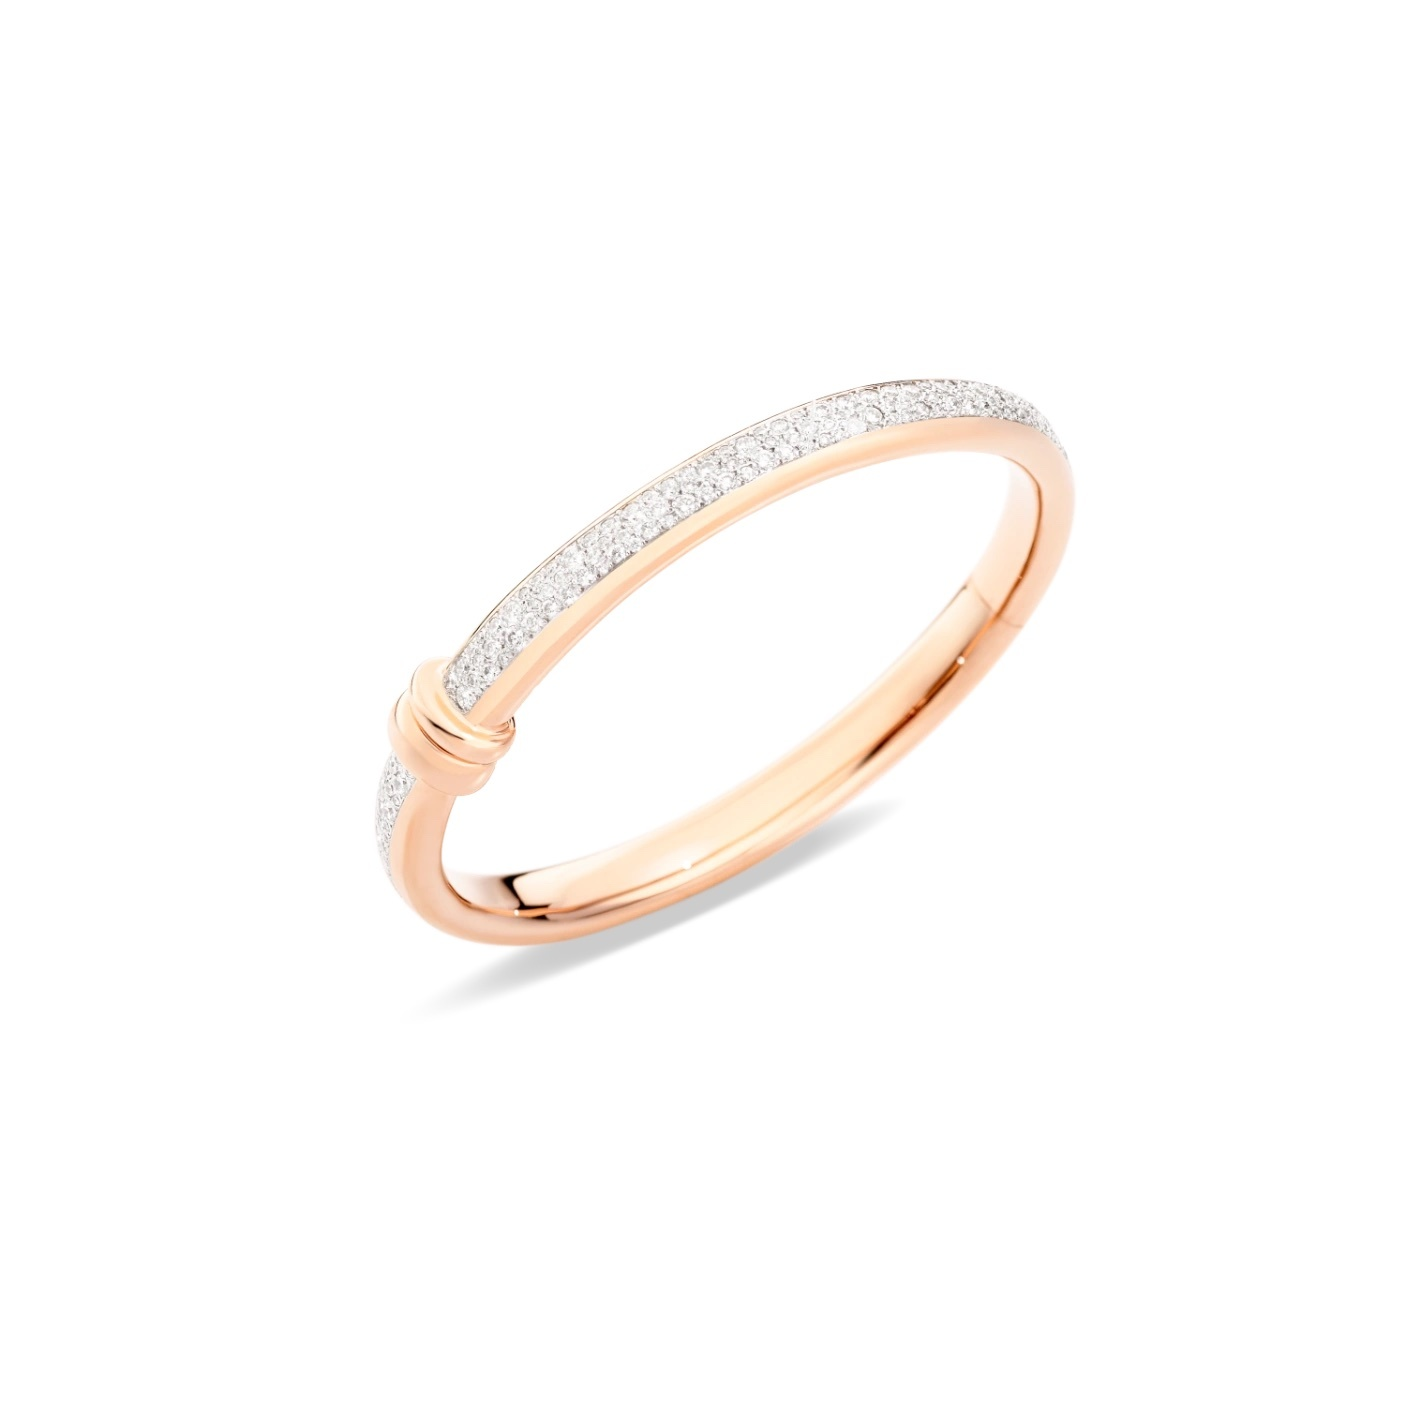 Pomellato Pomellato Iconica armband in 18 krt. roségoud met witte diamanten